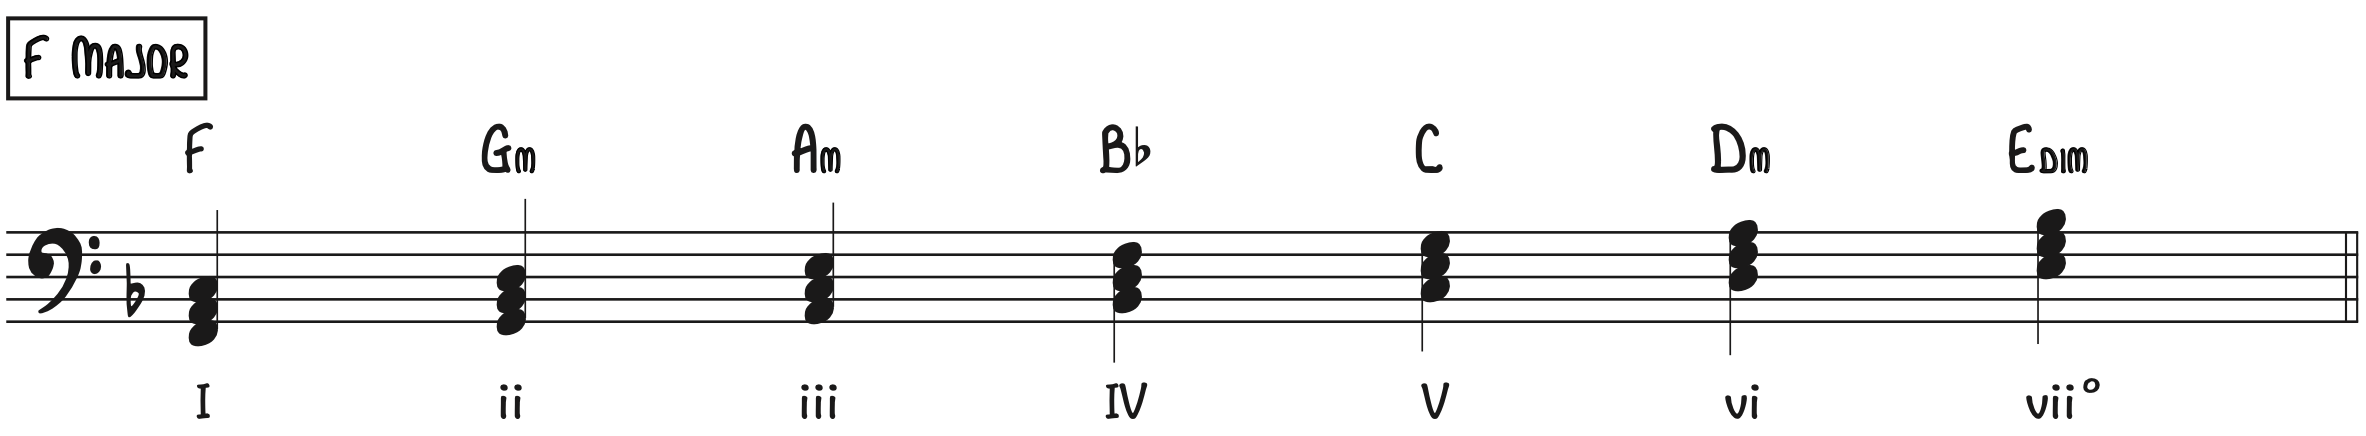 F Major Diatonic Chords